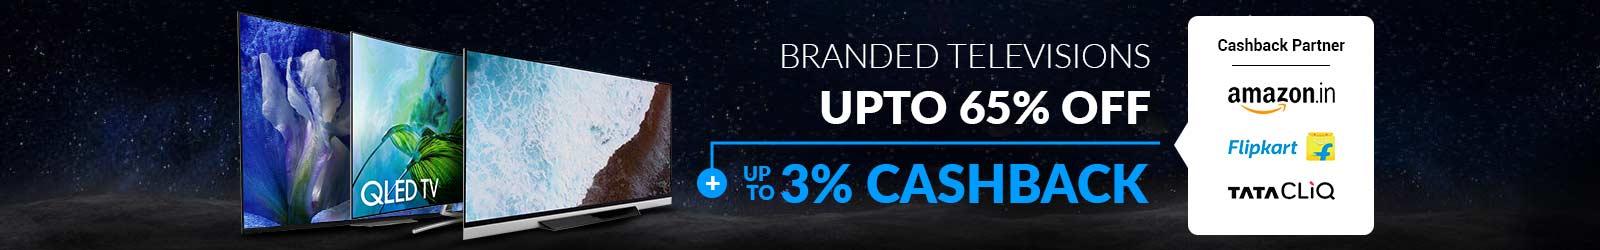 d2d6f3a44a6 TV Price Online  Upto 50% Off Offers + 3% Cashback